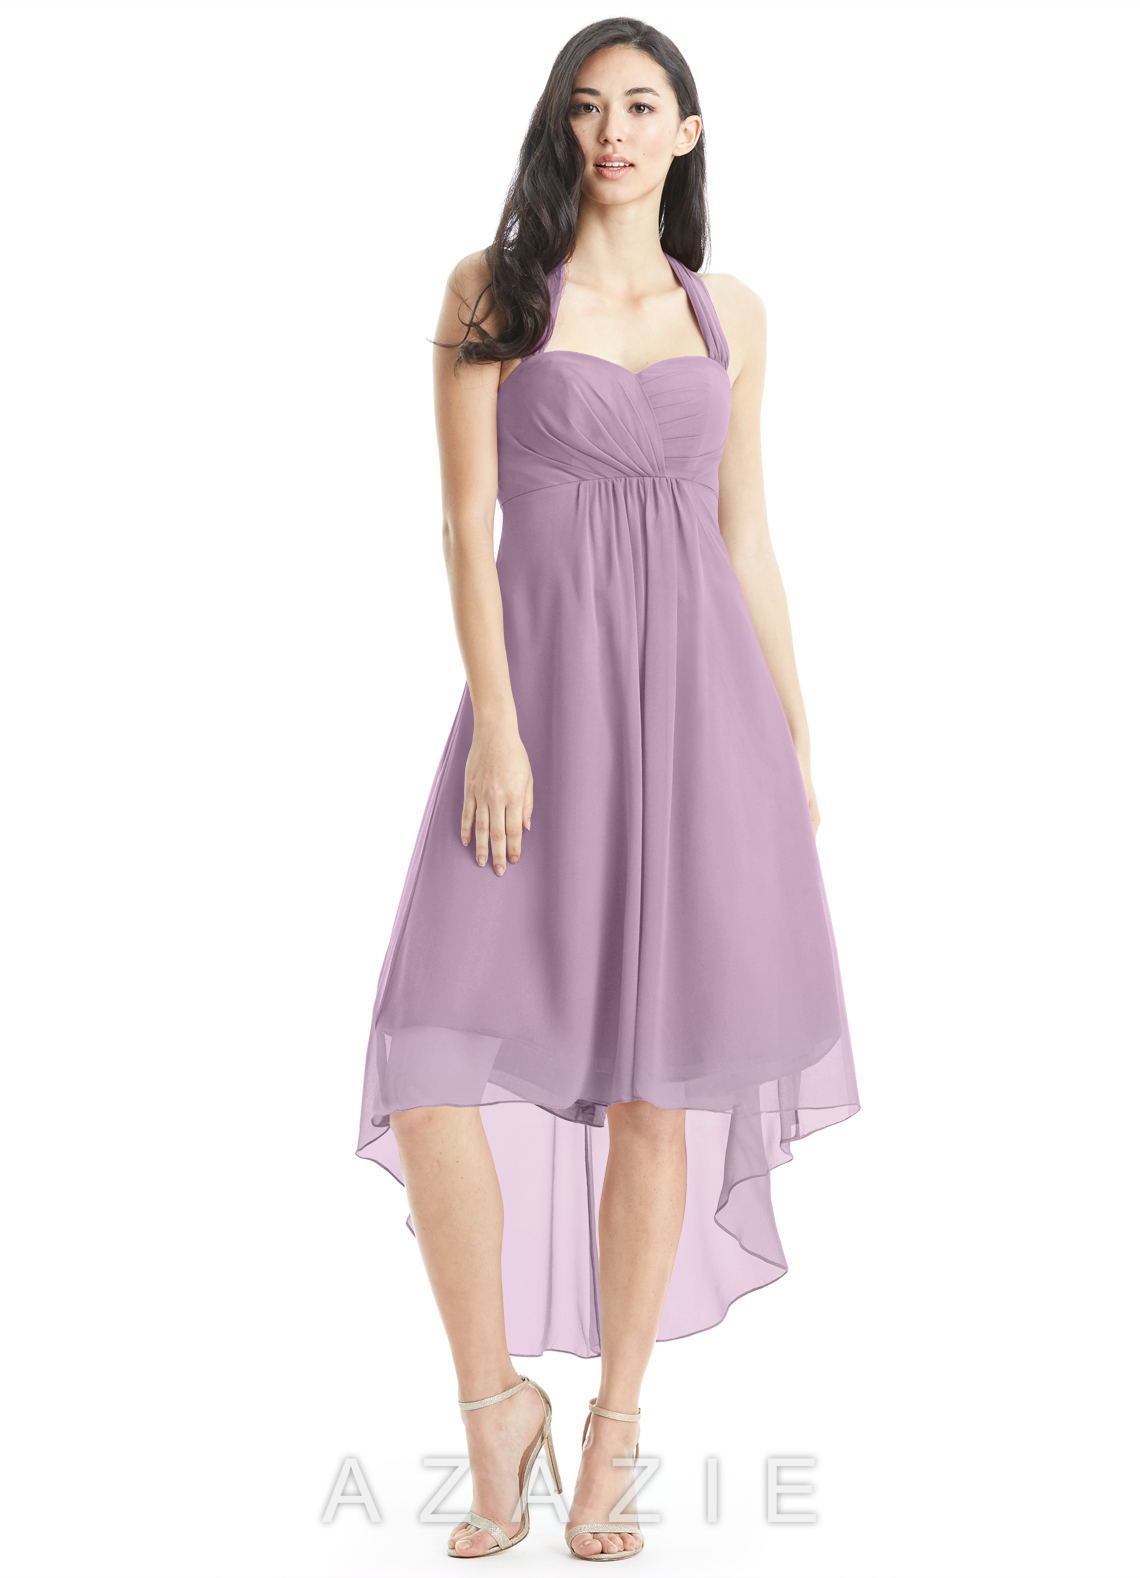 Azazie annabel bridesmaid dress azazie loading zoom ombrellifo Image collections